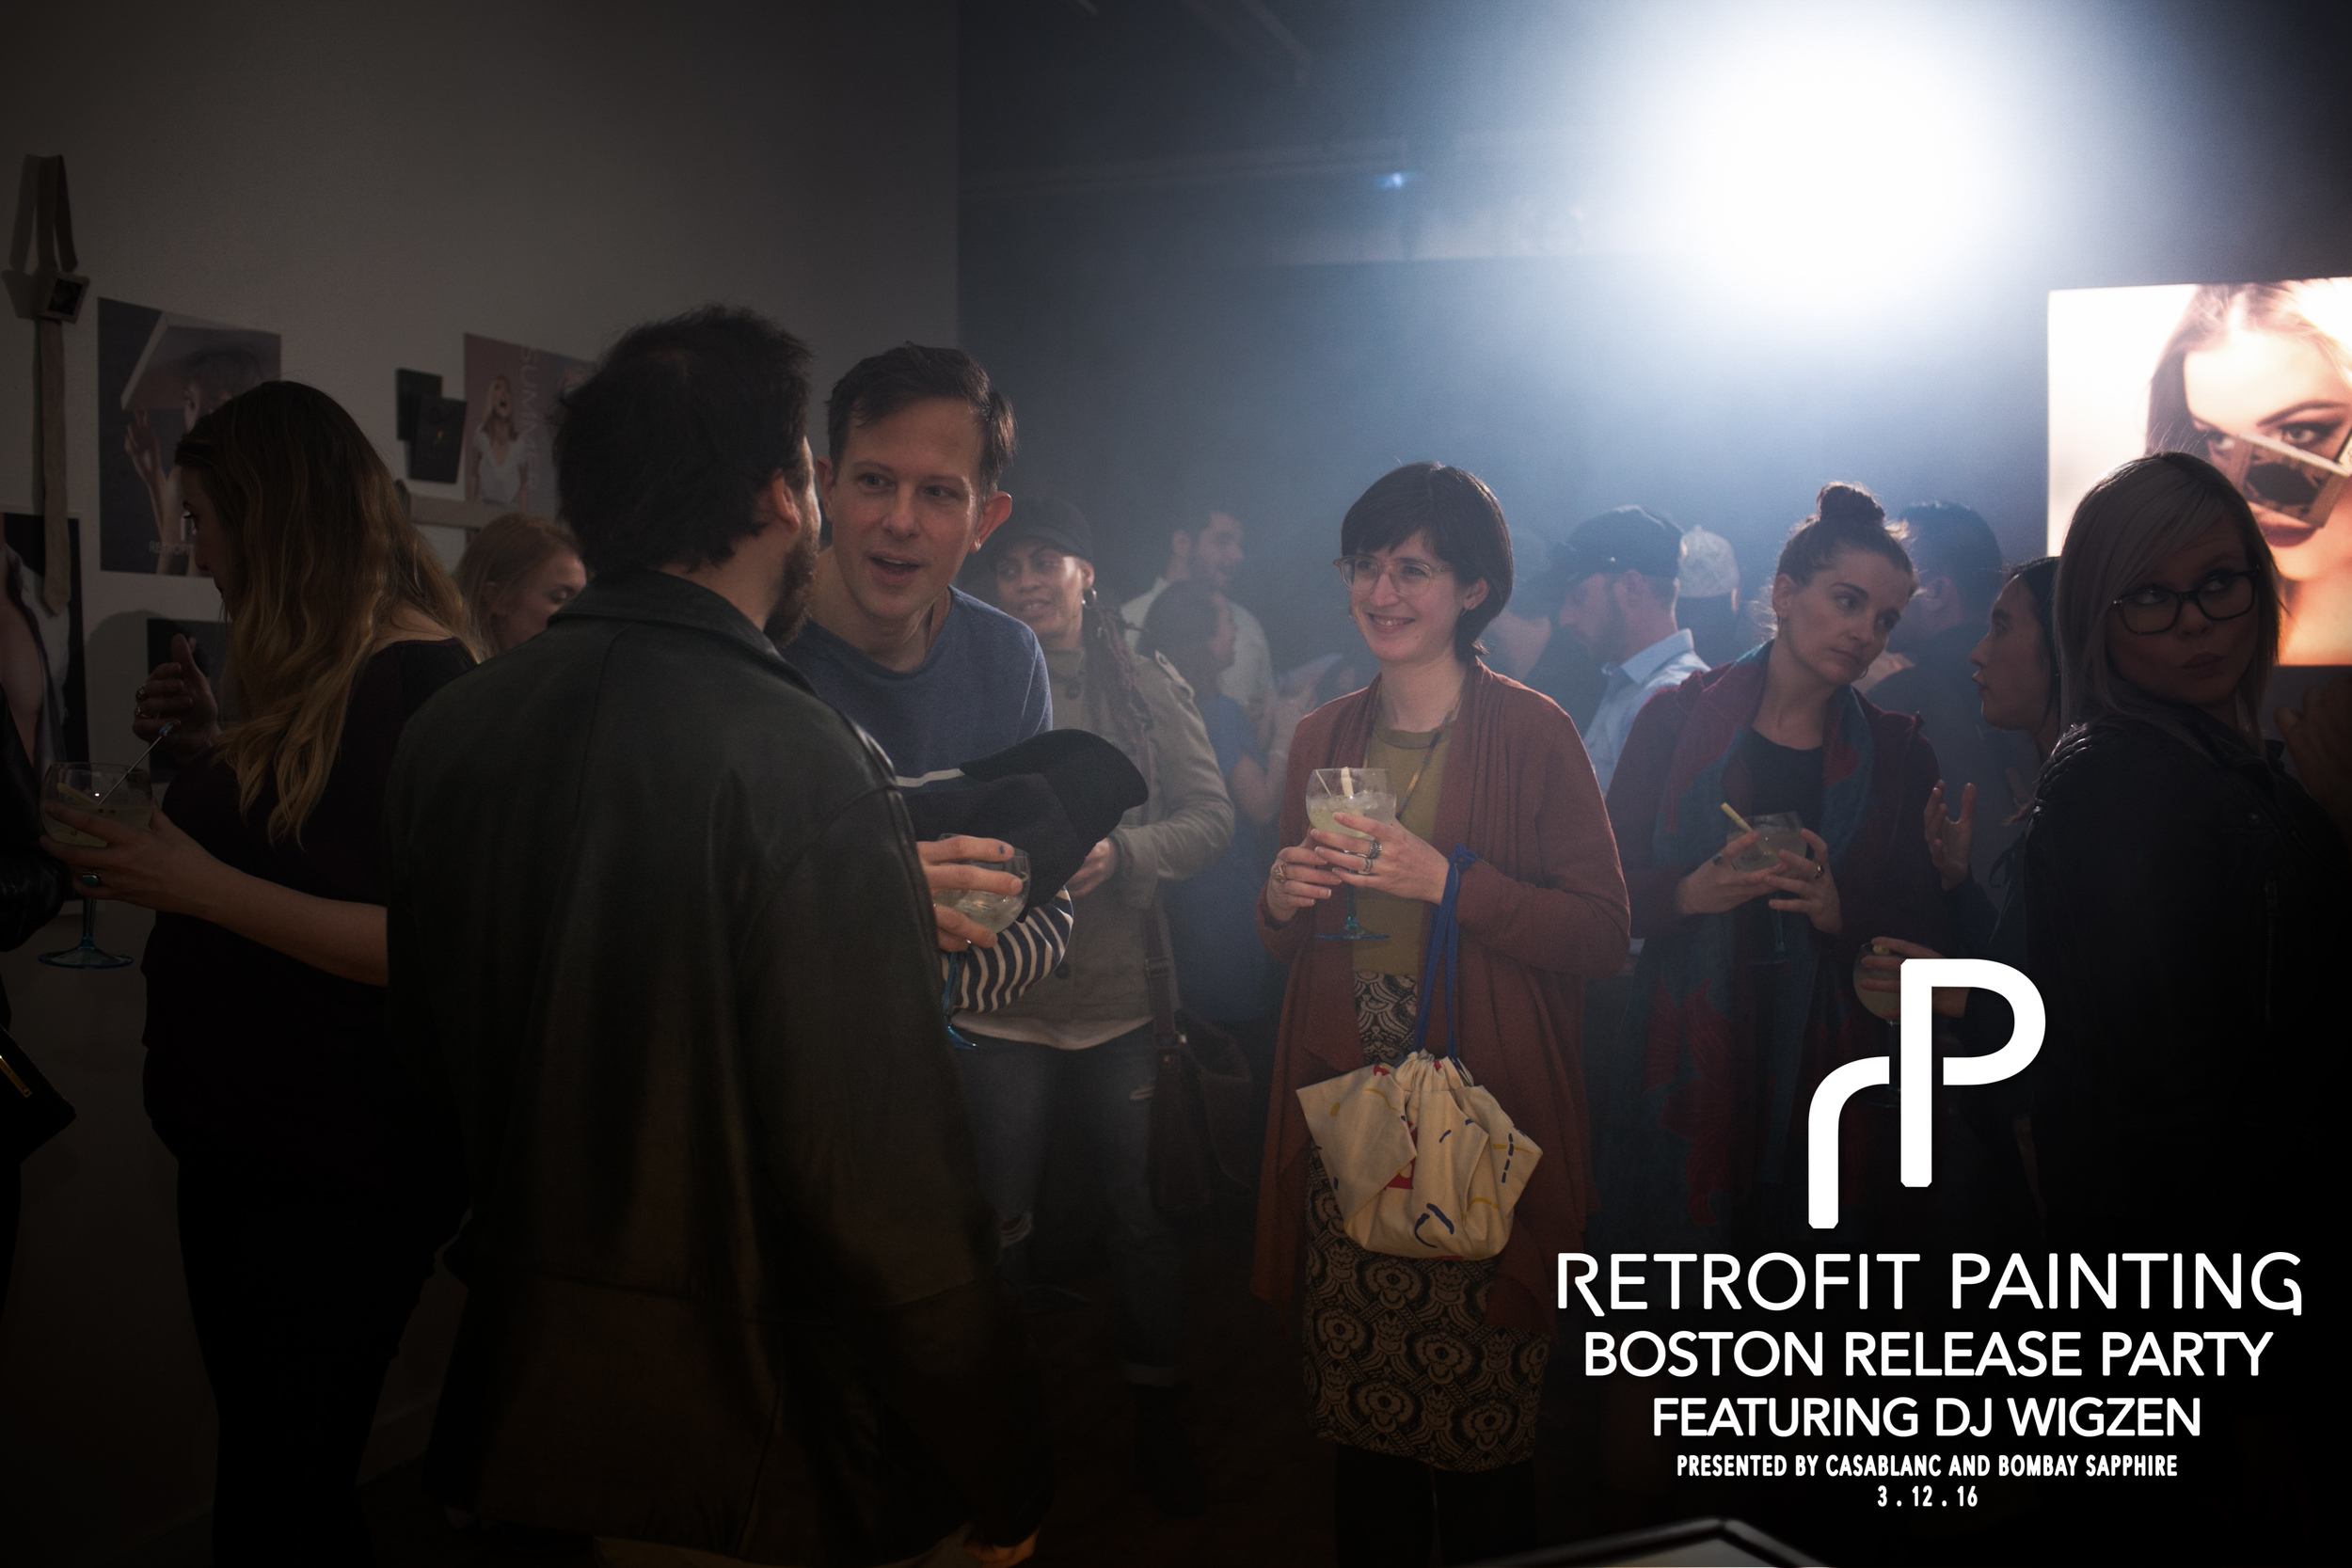 Retrofit Painting Boston Release Party 0191.jpg